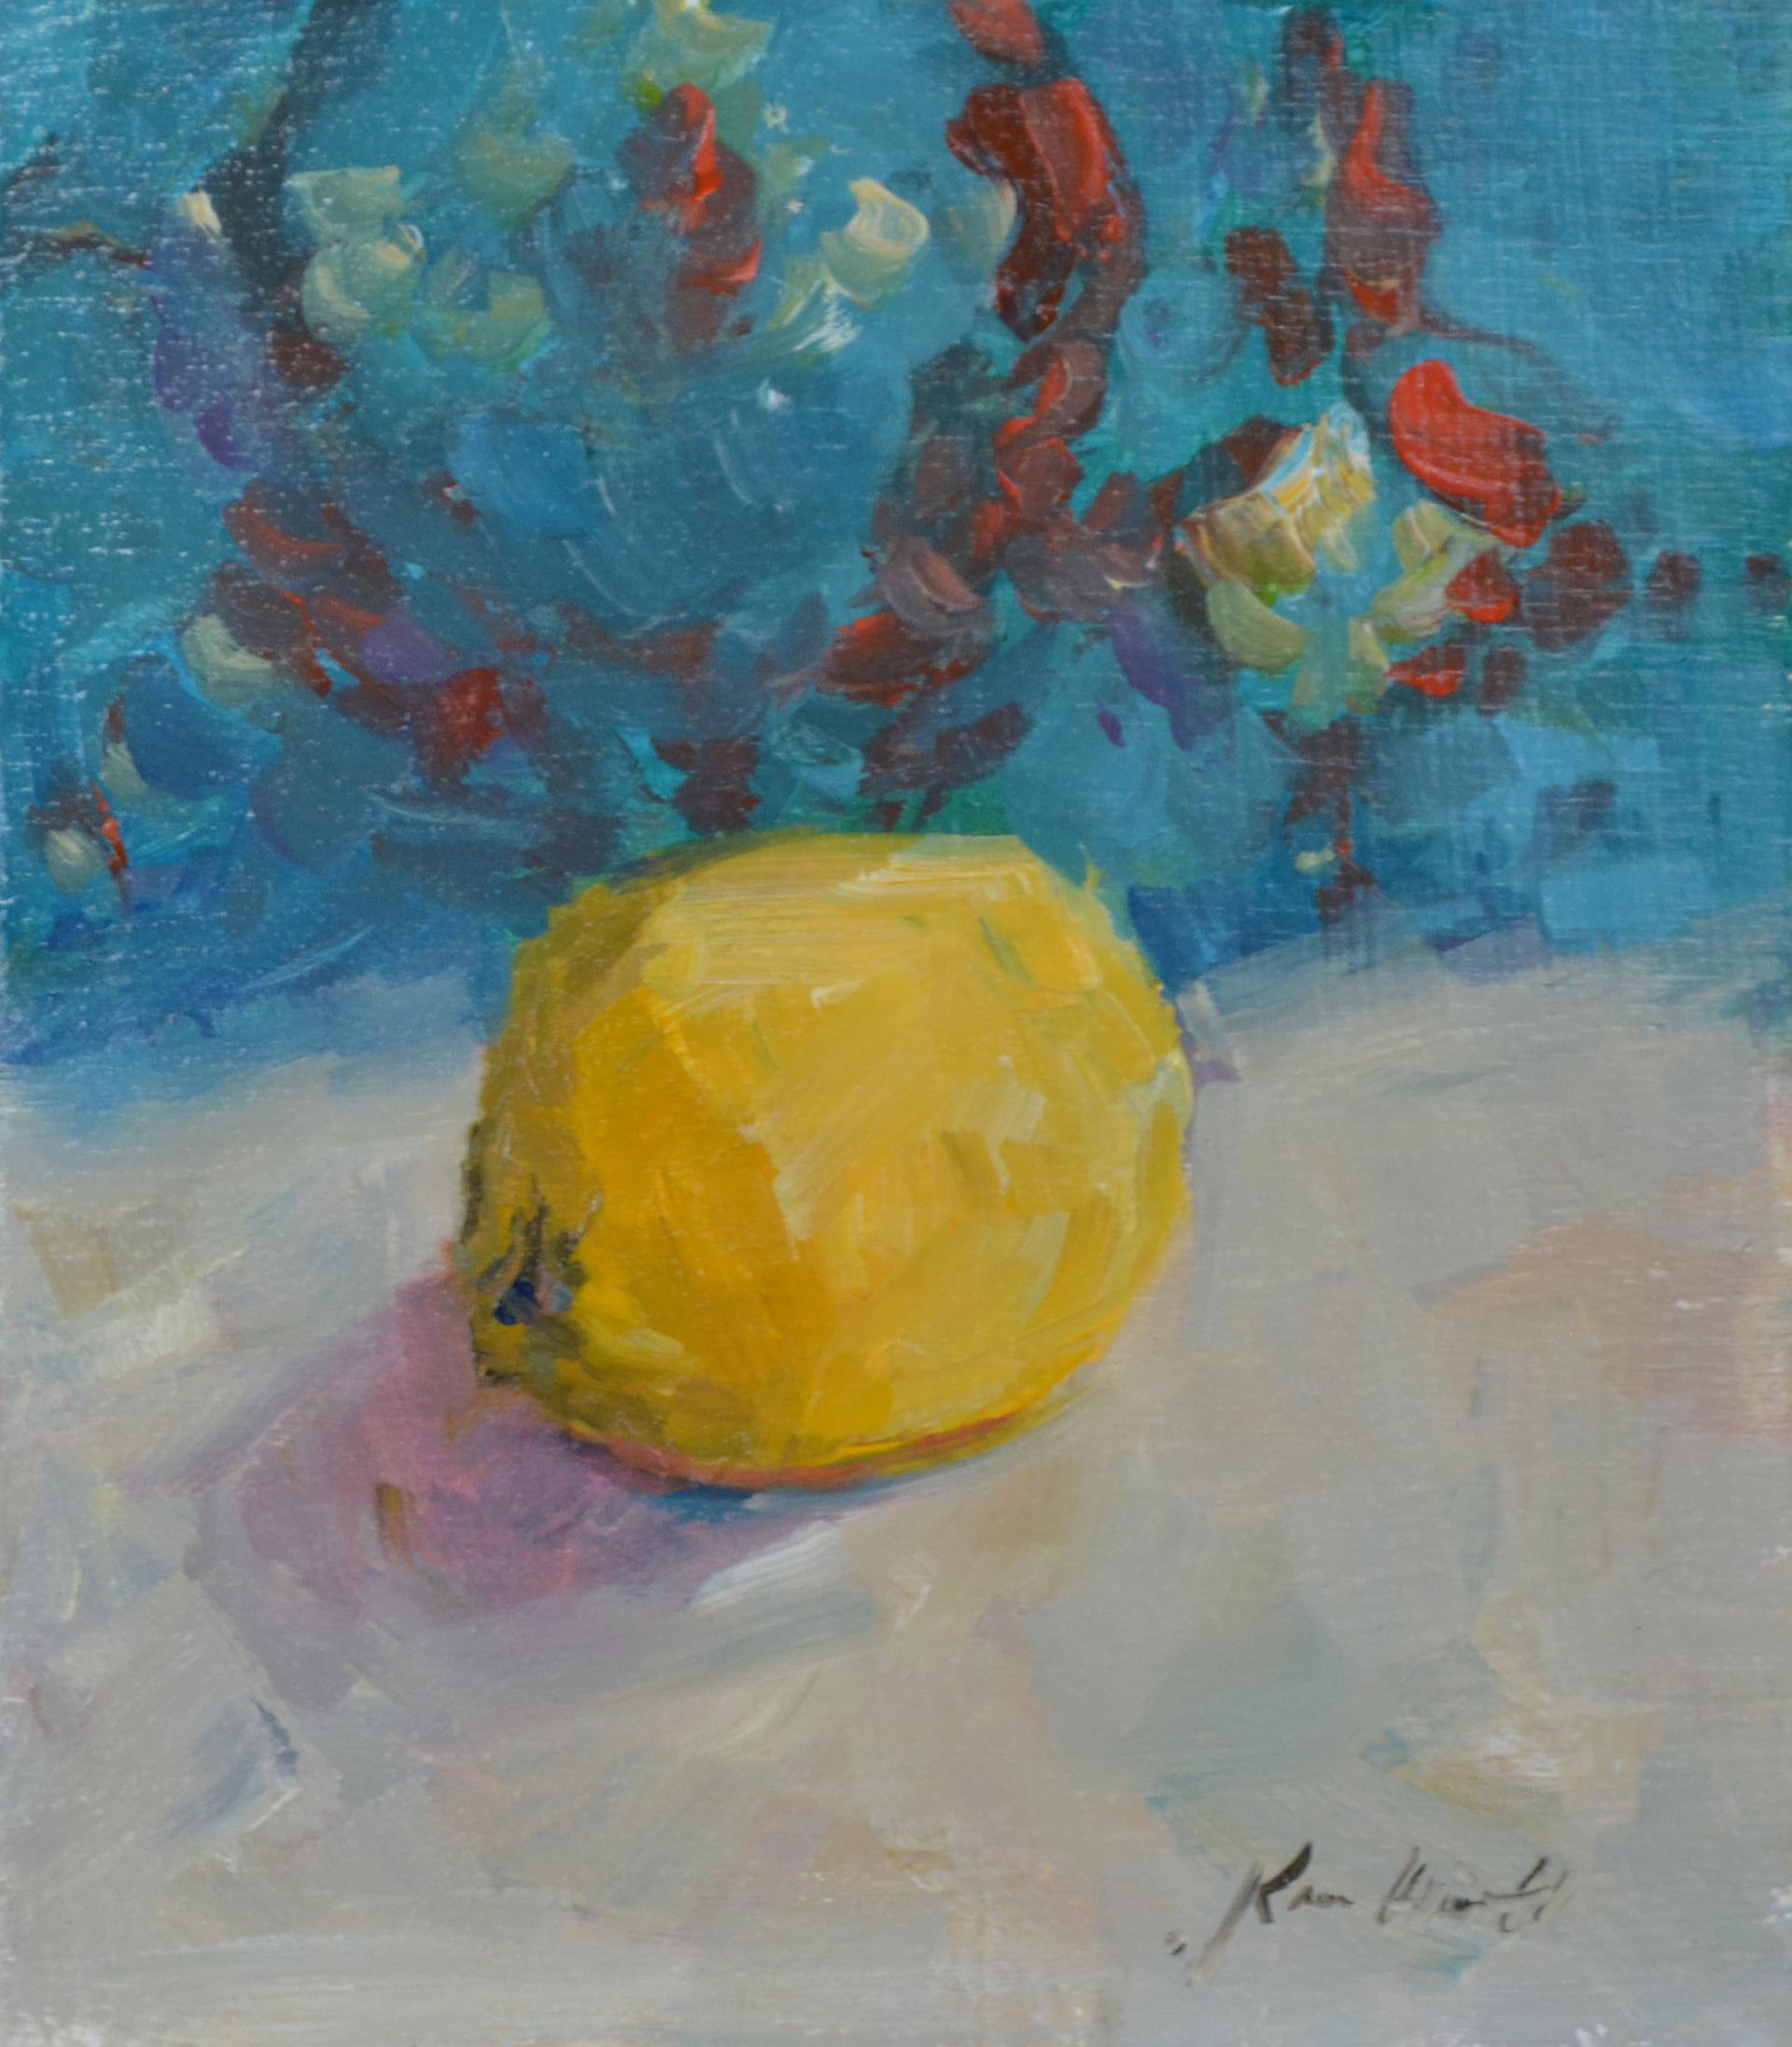 Yellow and Aqua by Karen Hewitt Hagan